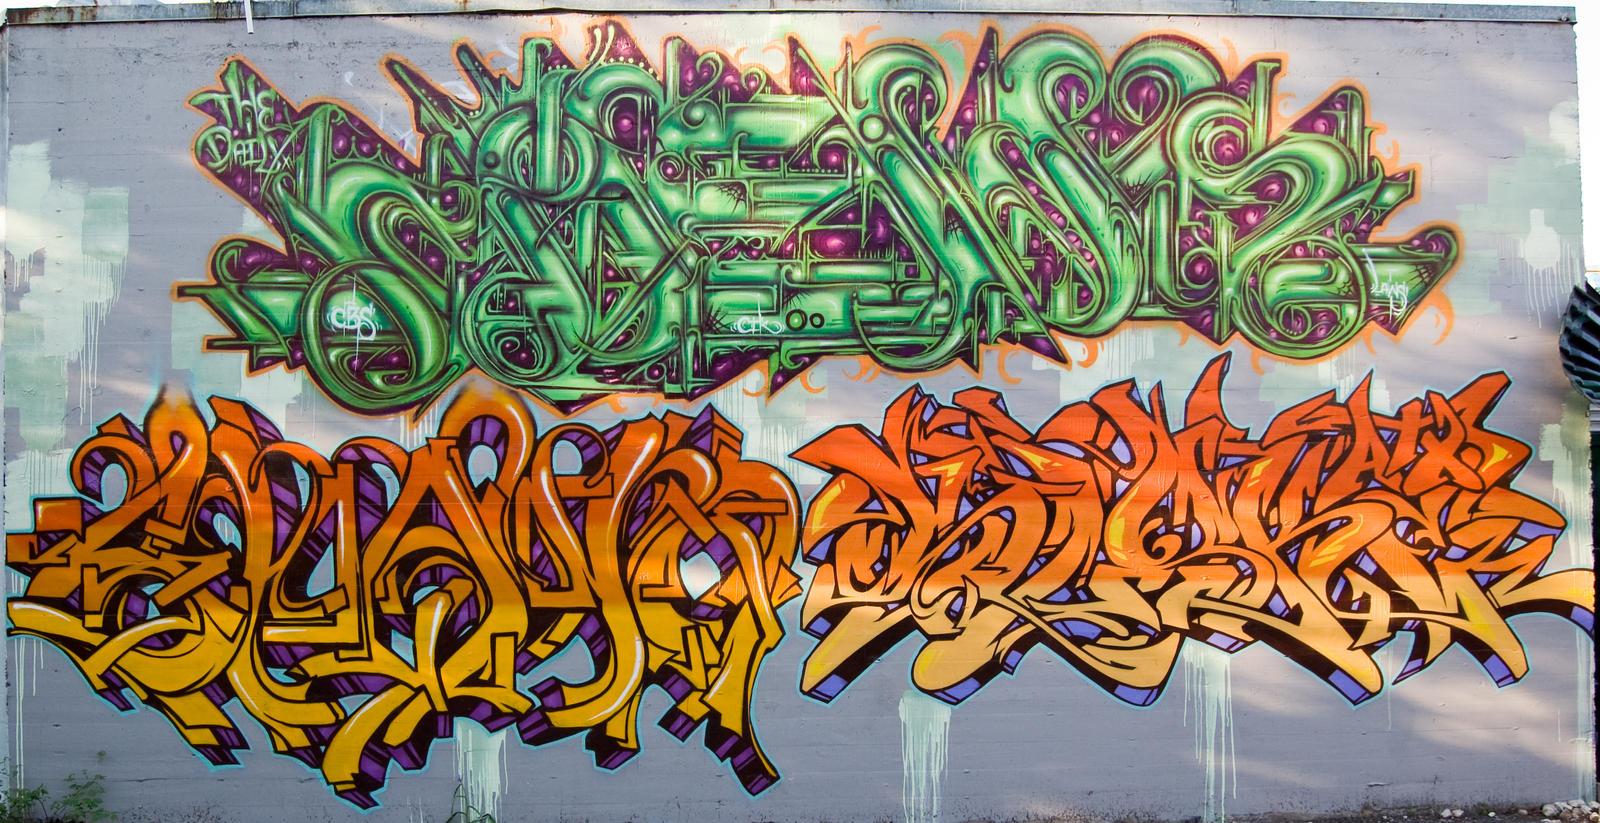 Designers guide to graffiti fonts rushordertees blog wildstyle graffiti writing via altavistaventures Image collections